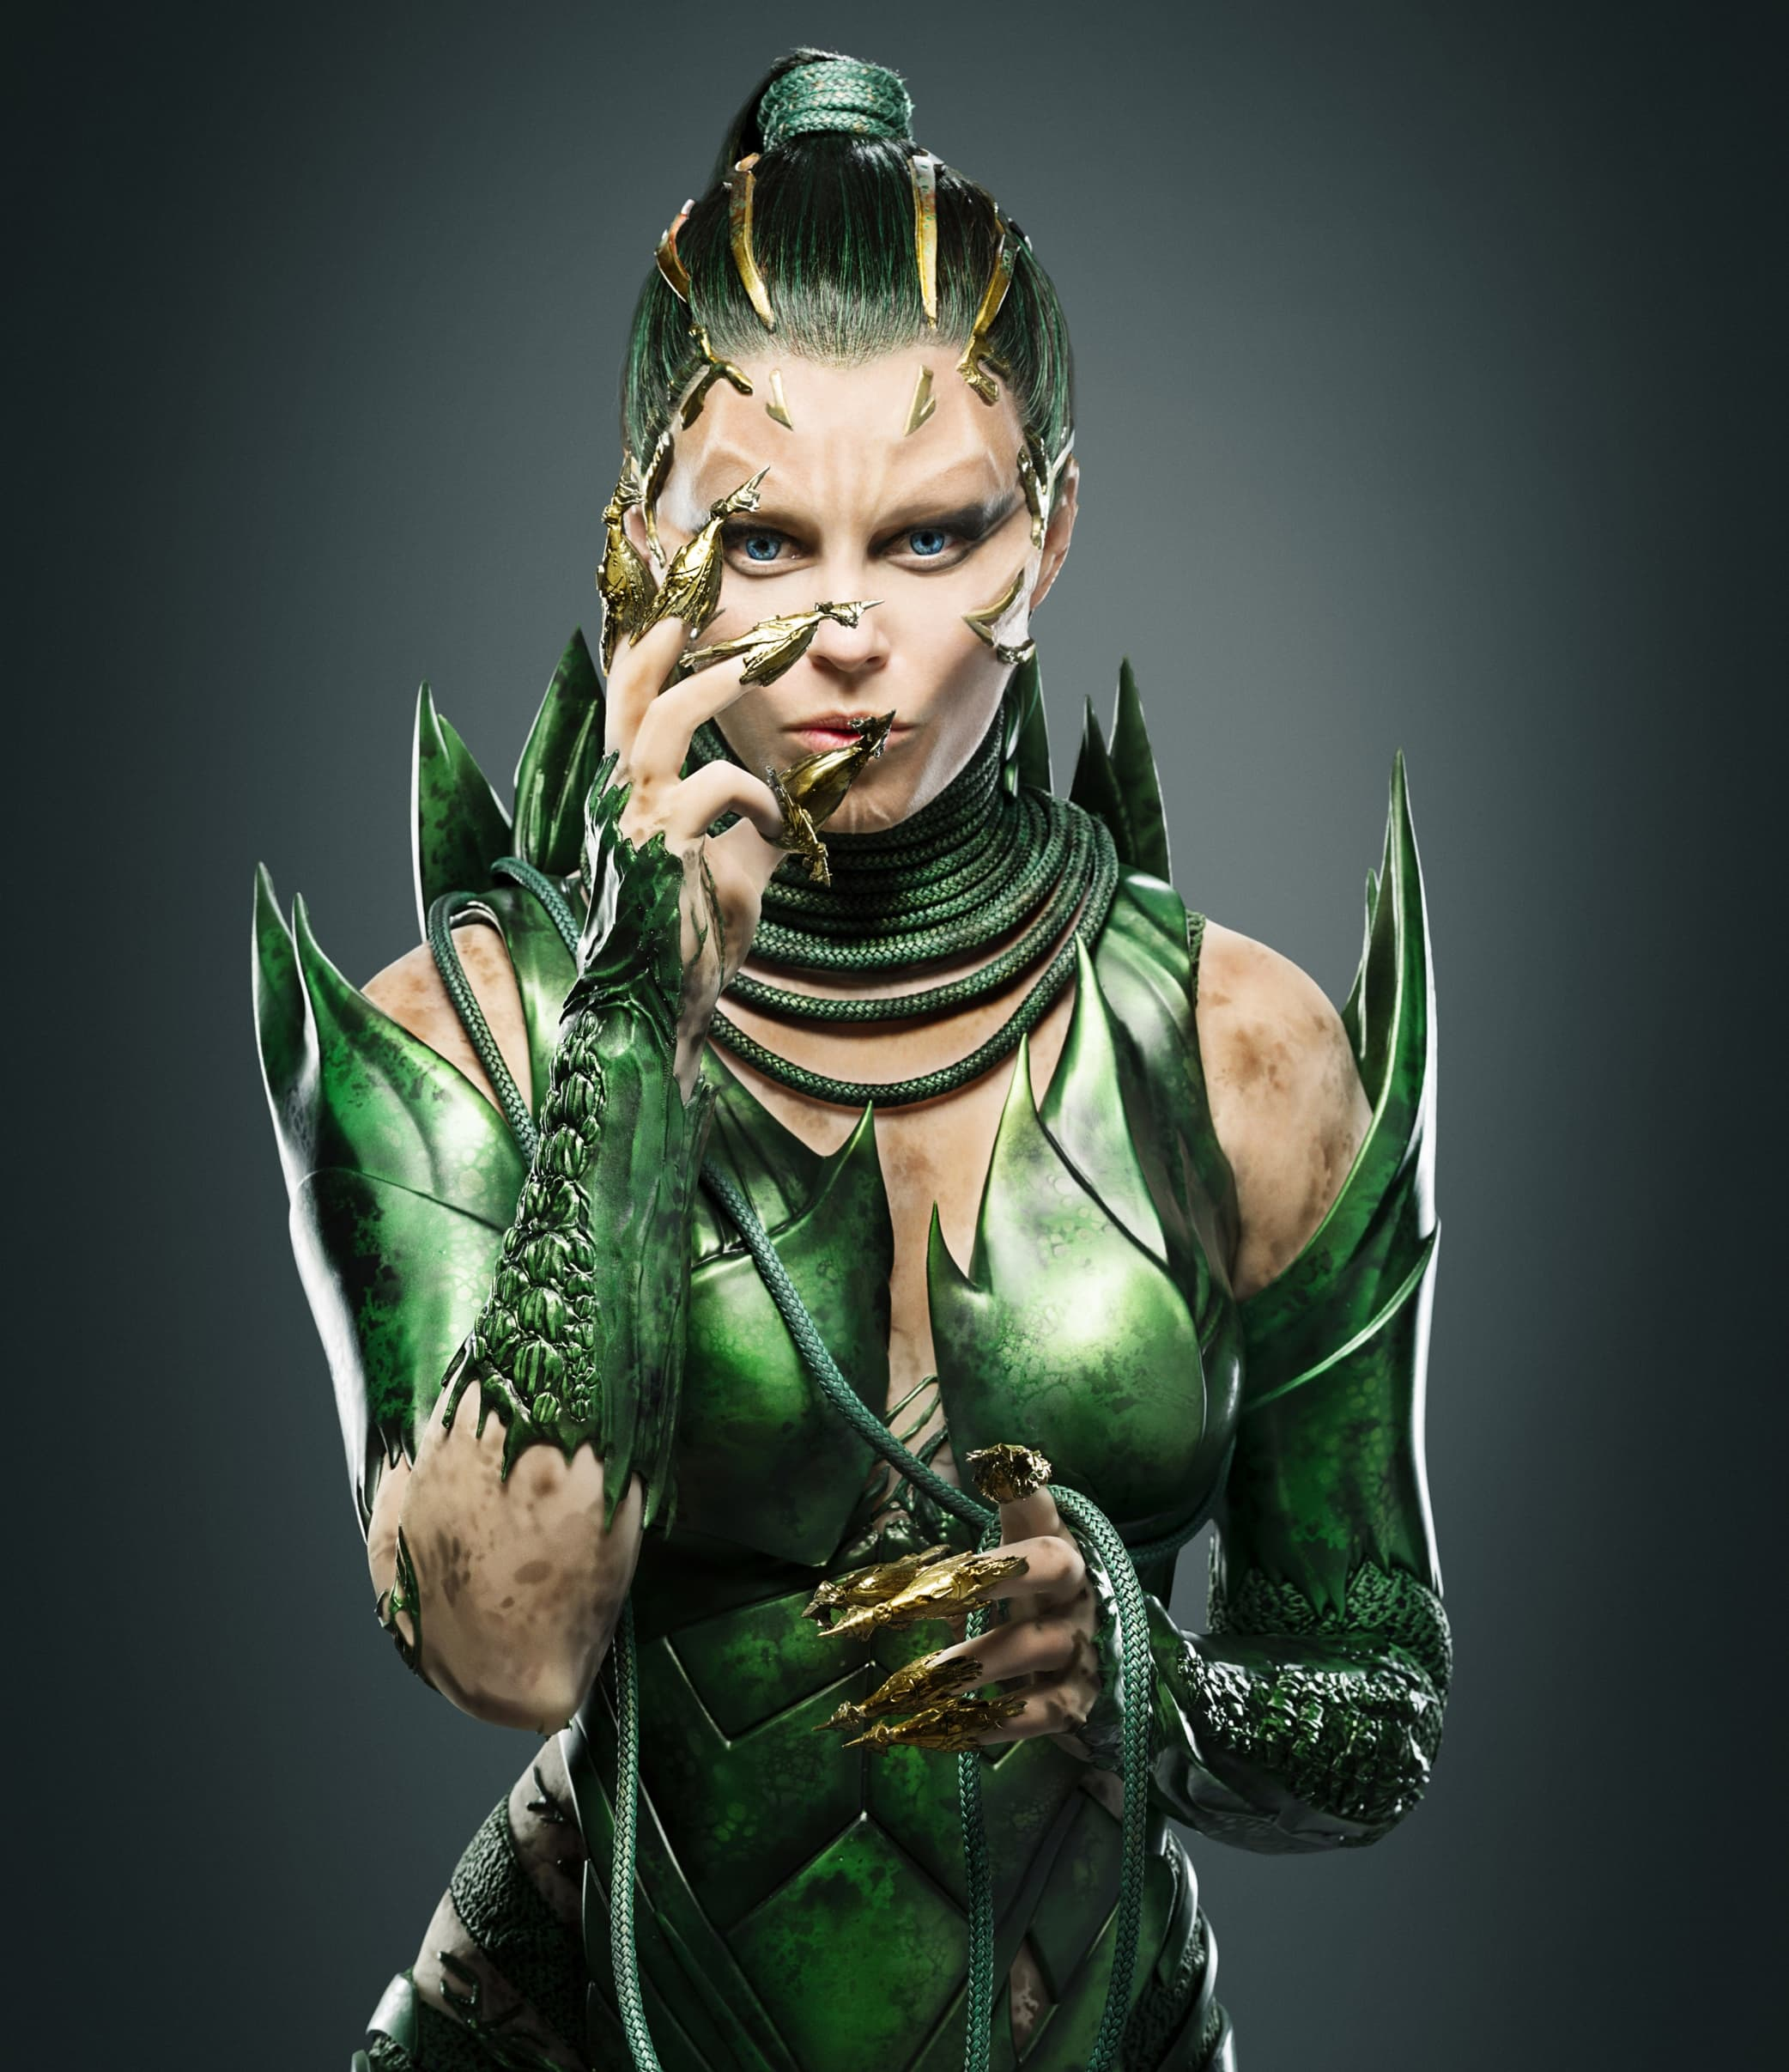 Elizabeth Banks plays space alien Rita Repulsa in the 2017 Power Rangers reboot film